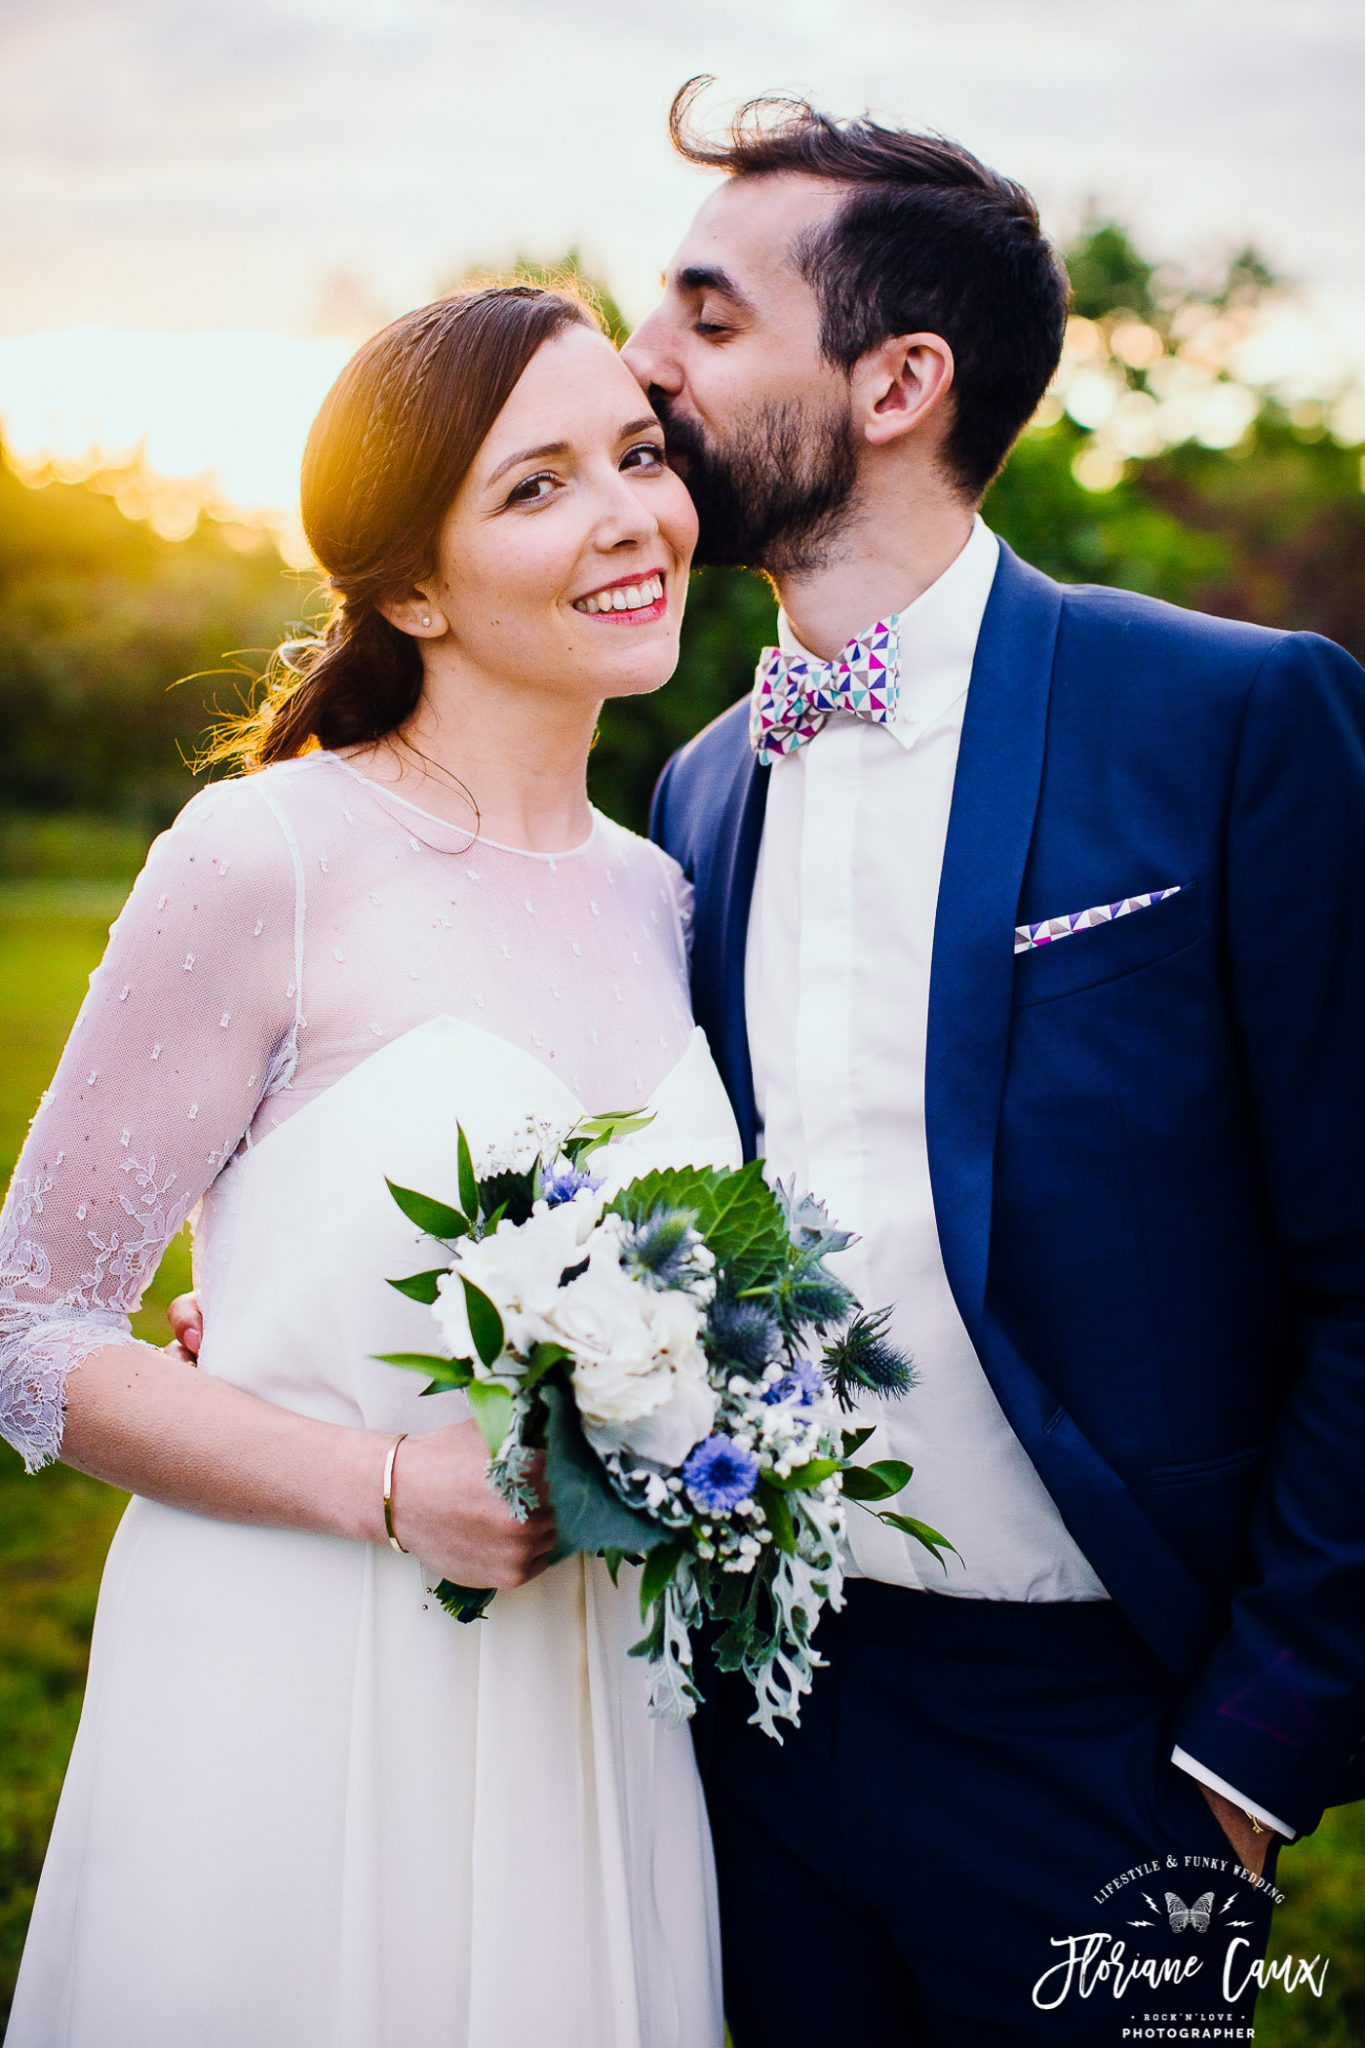 photographe-mariage-pays-basque-Floriane-Caux (83)